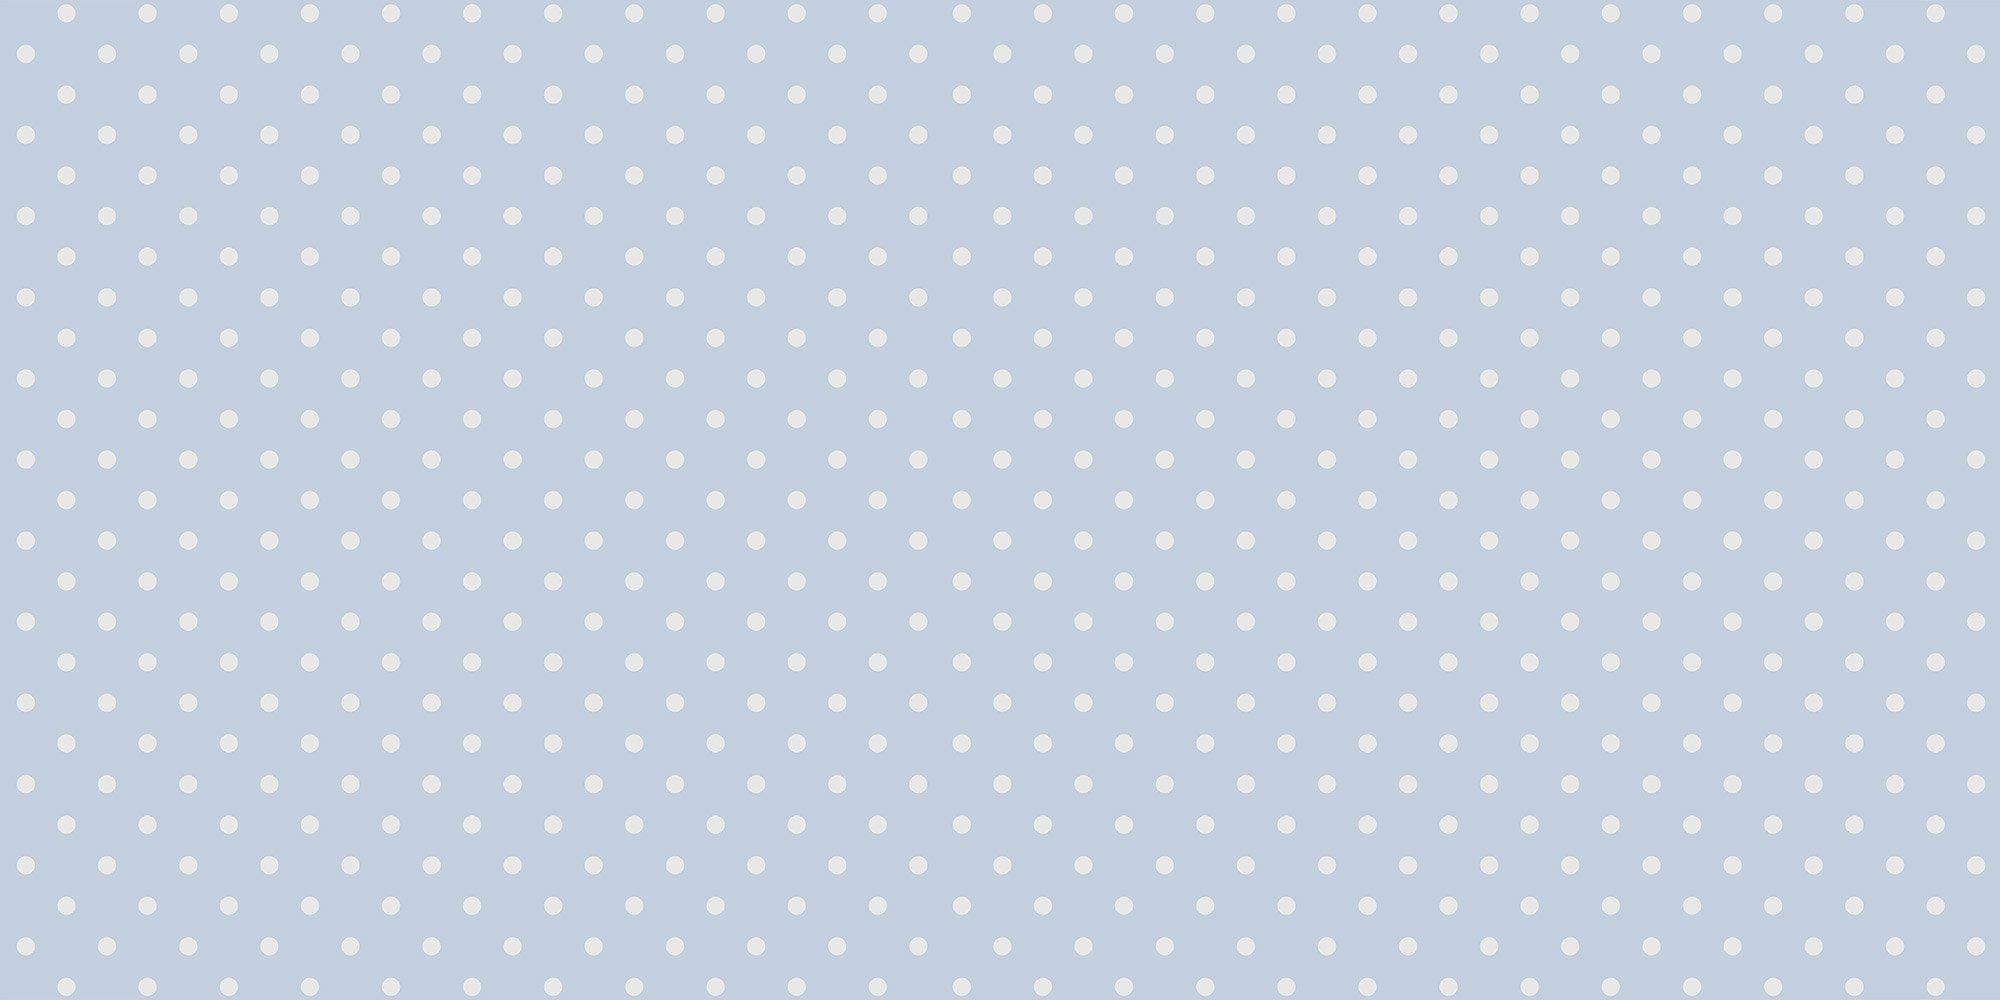 FPTFY-PolkaDot-PaperPack-LiteBlue1